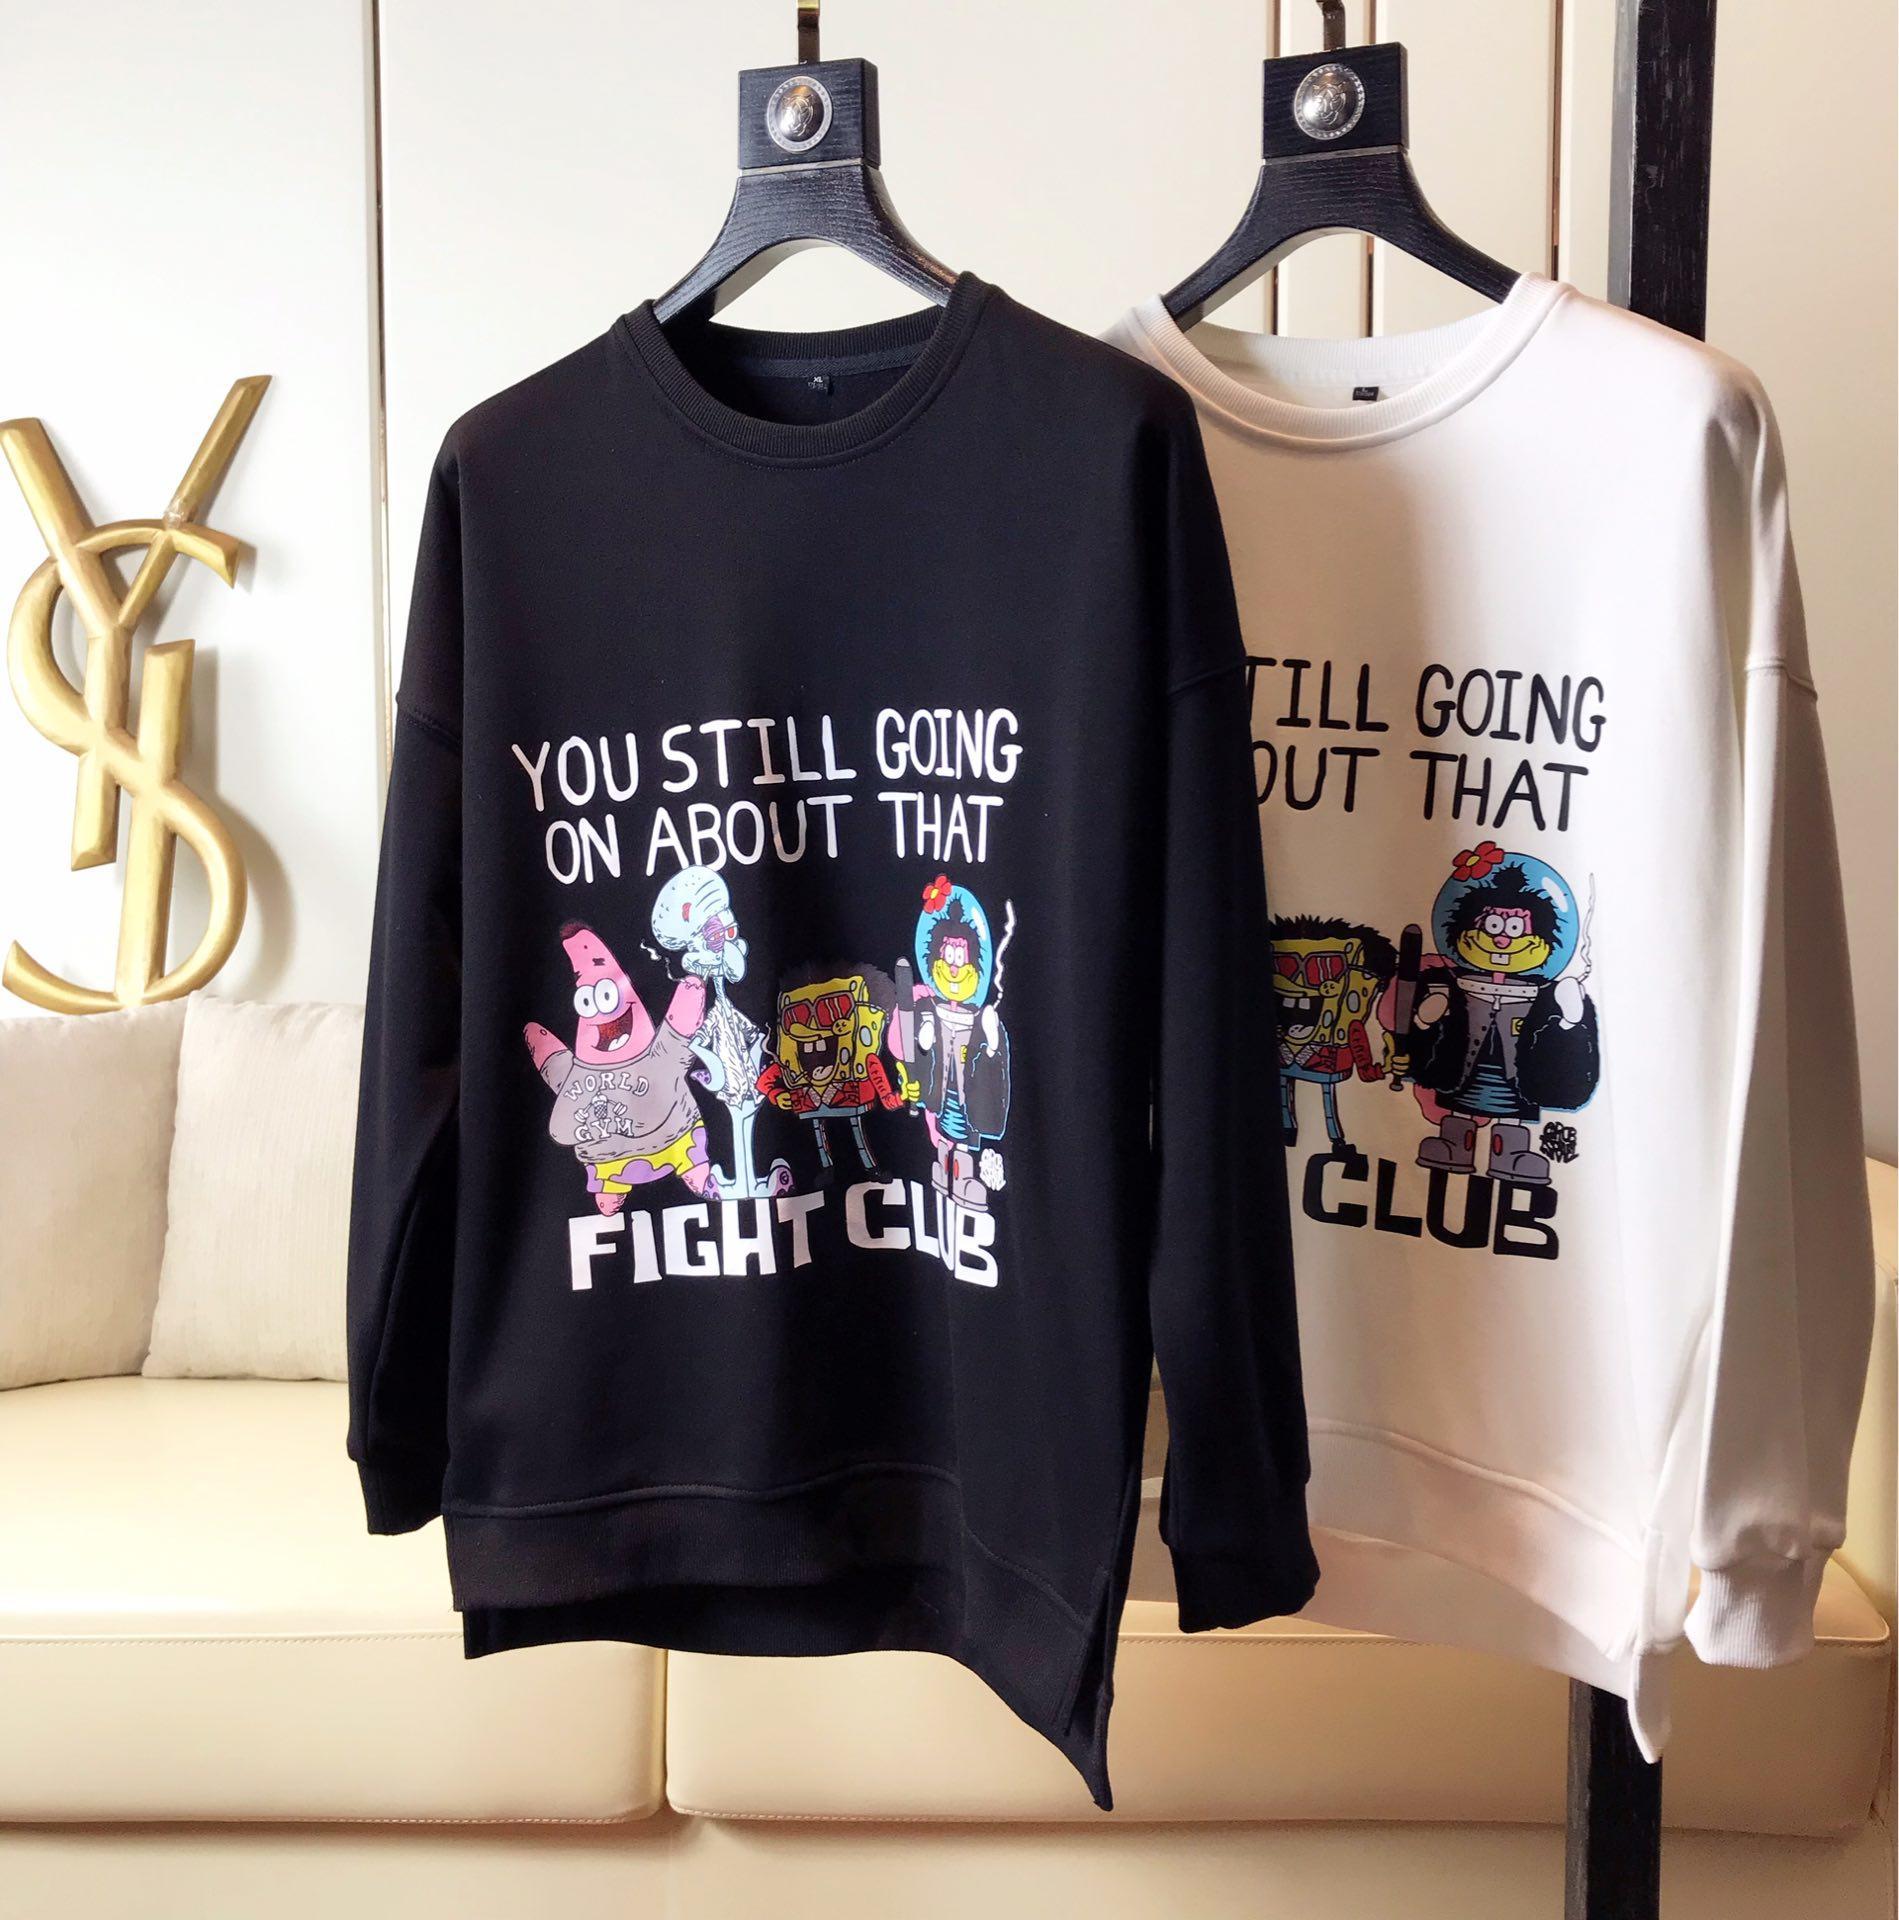 潮流街头风系列Givenchy纪梵希